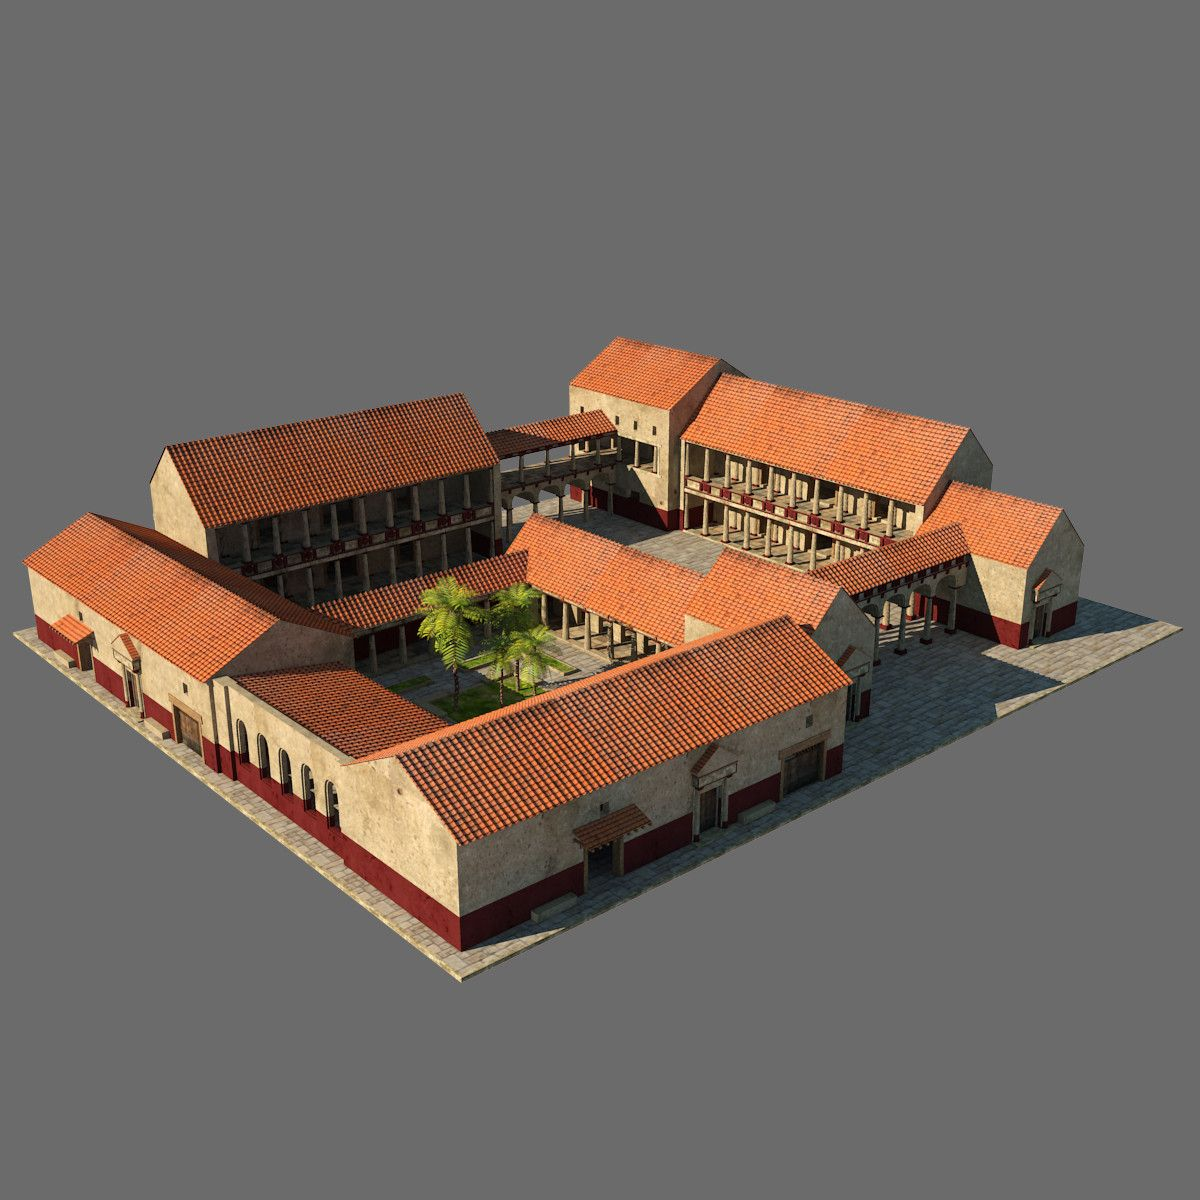 Greekhouses00b Jpg1d5ae7d9 9e5c 4af3 9f4a F75abae15260original Jpg 1200 1200 Ancient Greek Architecture Ancient Roman Houses Roman Villa